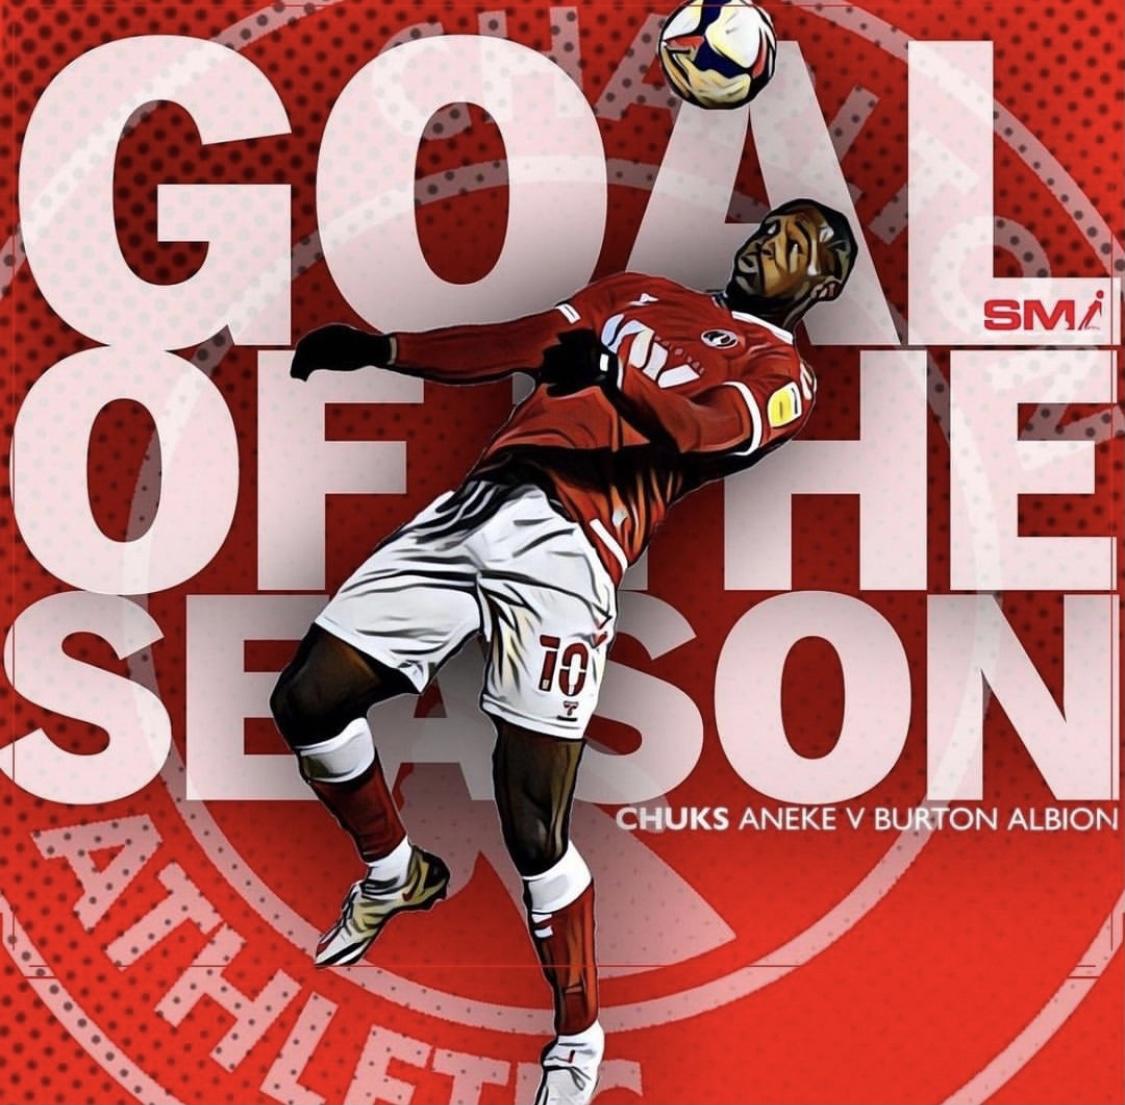 Goal of the season for big Chuks Aneke